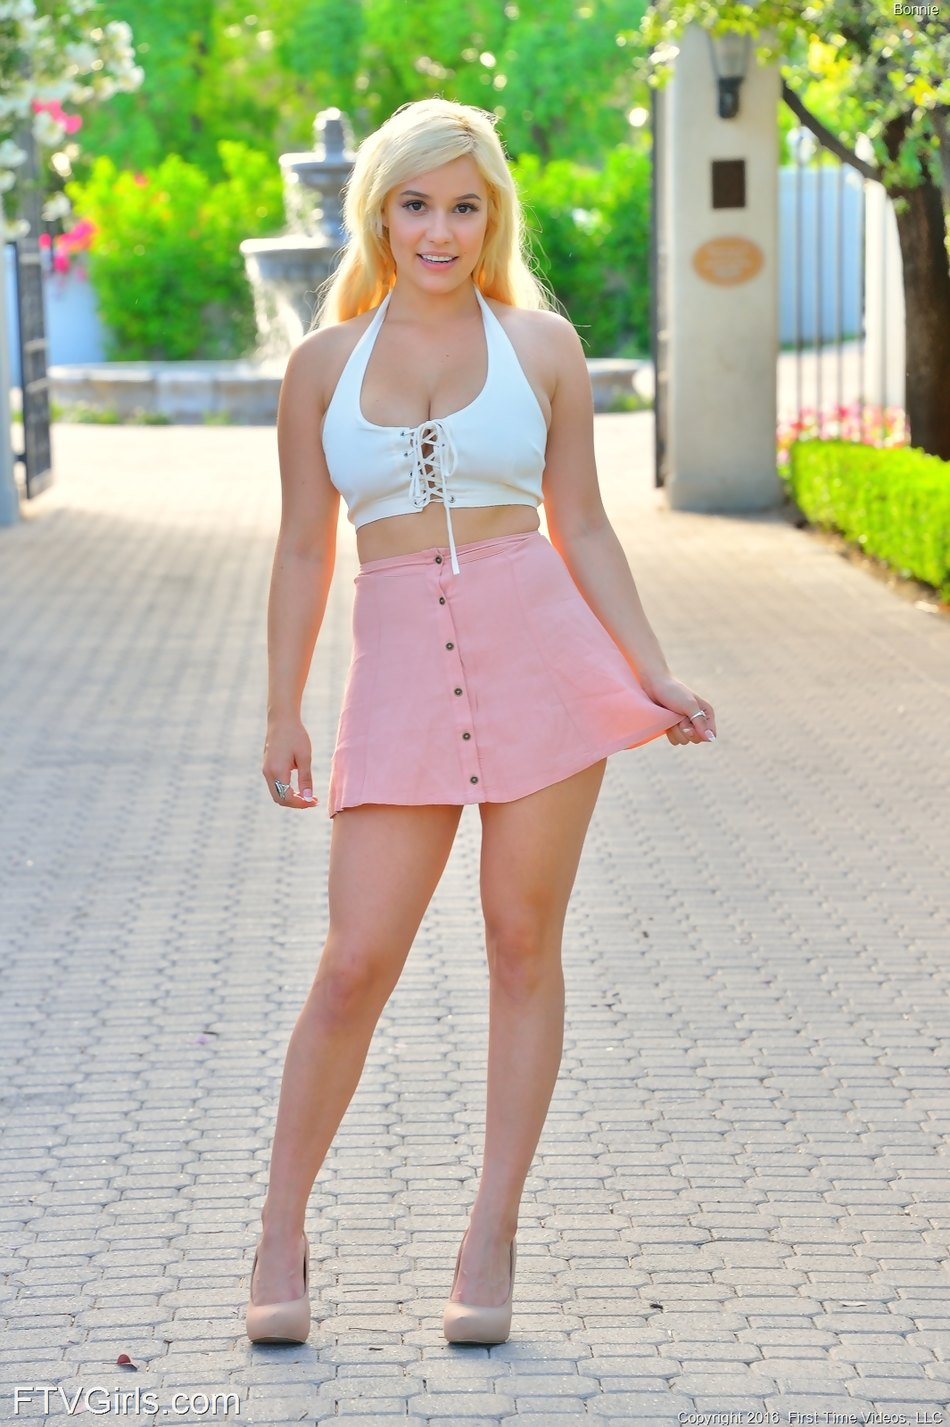 Ftv girls big boobs bonnie kinz Stunning Blonde Bonnie Kinz With Big Tits Loves Masturbating With Big Cucumbers By Ftv Girls Nude Xxx Pics